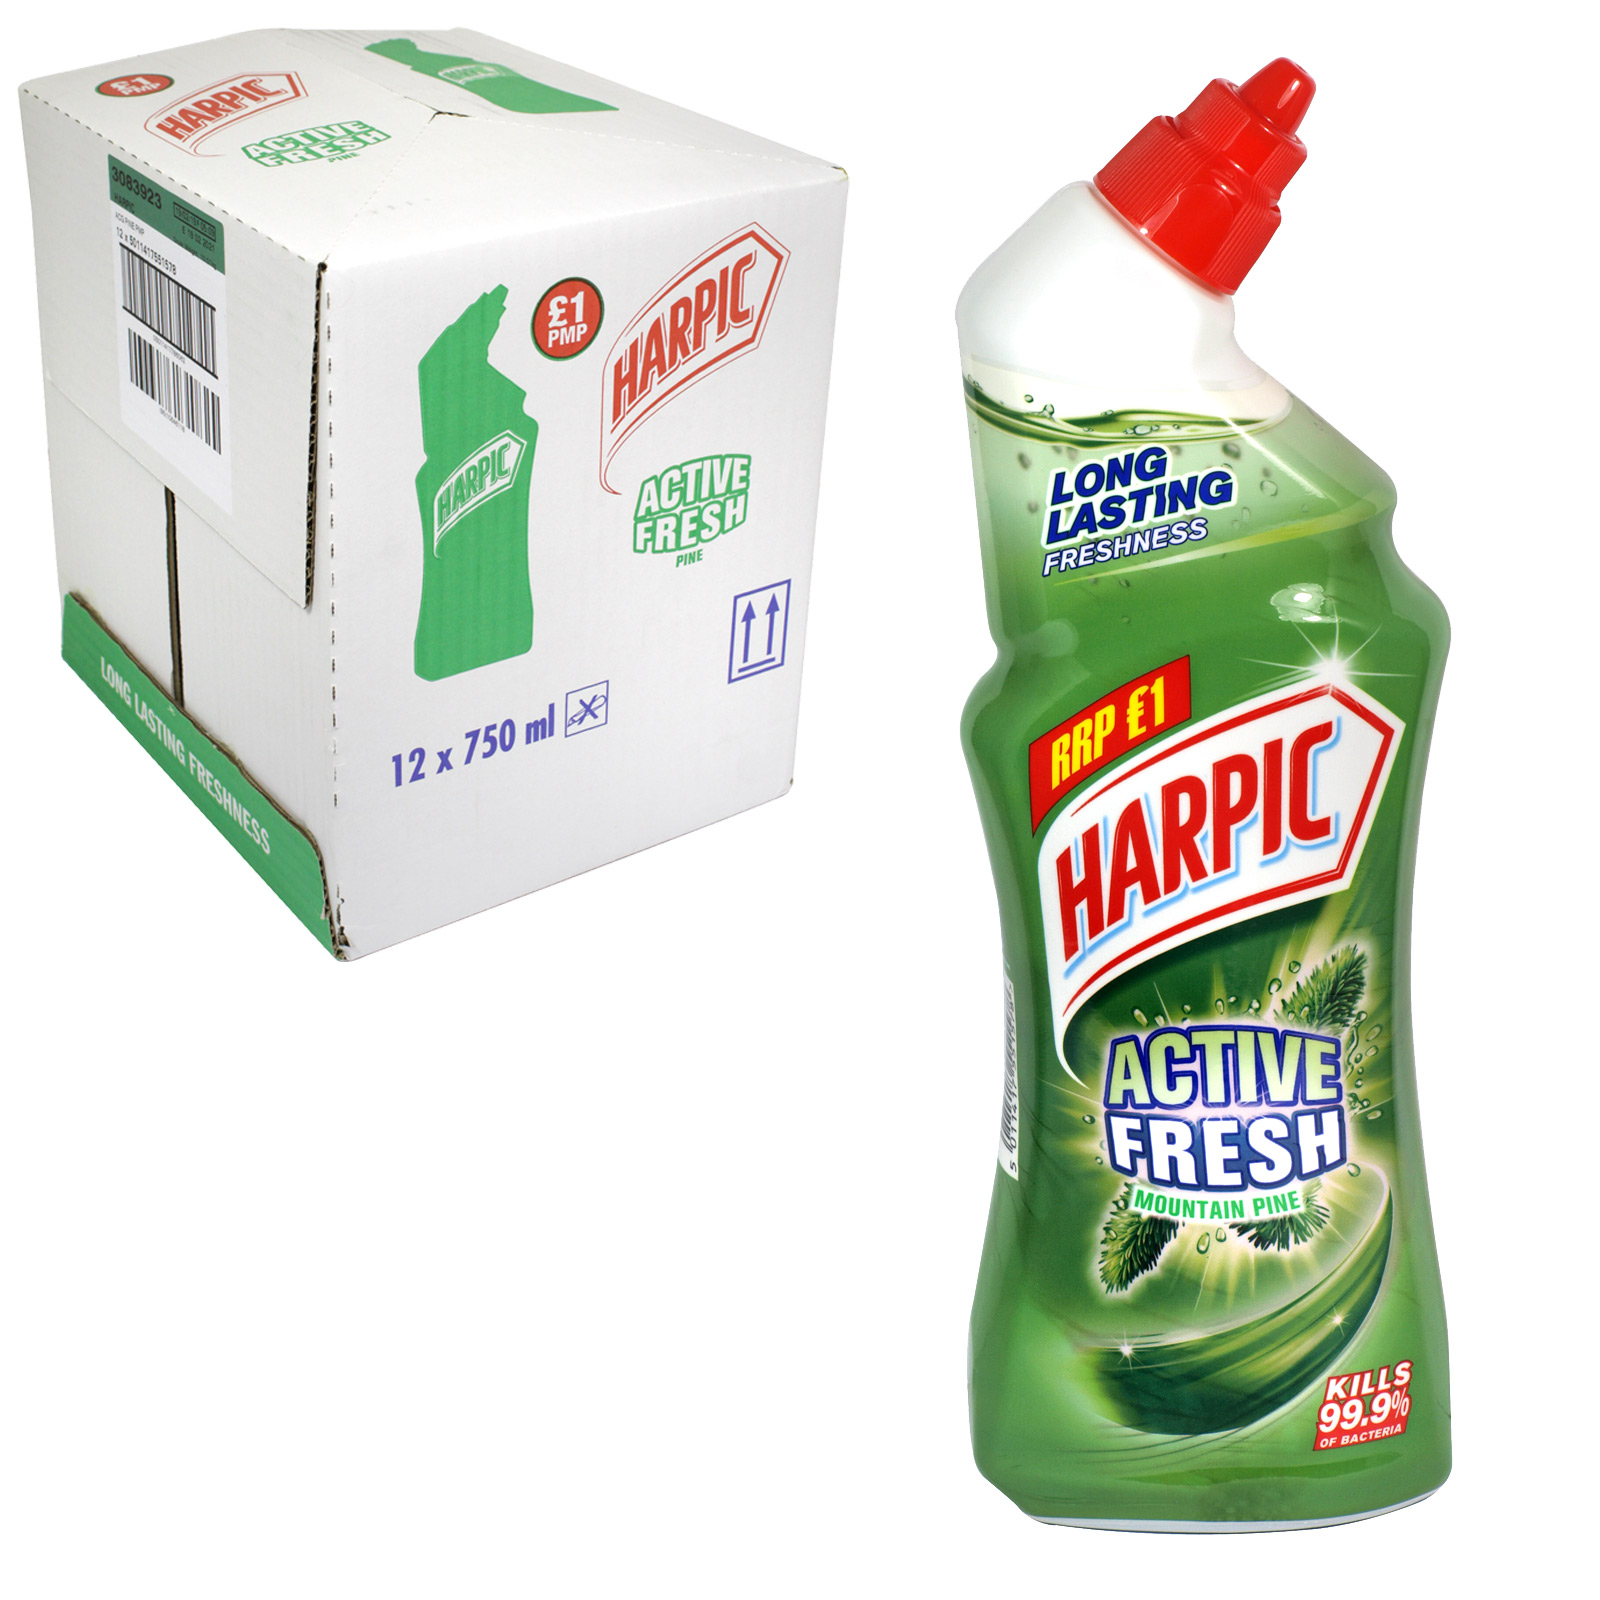 HARPIC ACT CLEAN GEL 750M PINE PM £1 X12